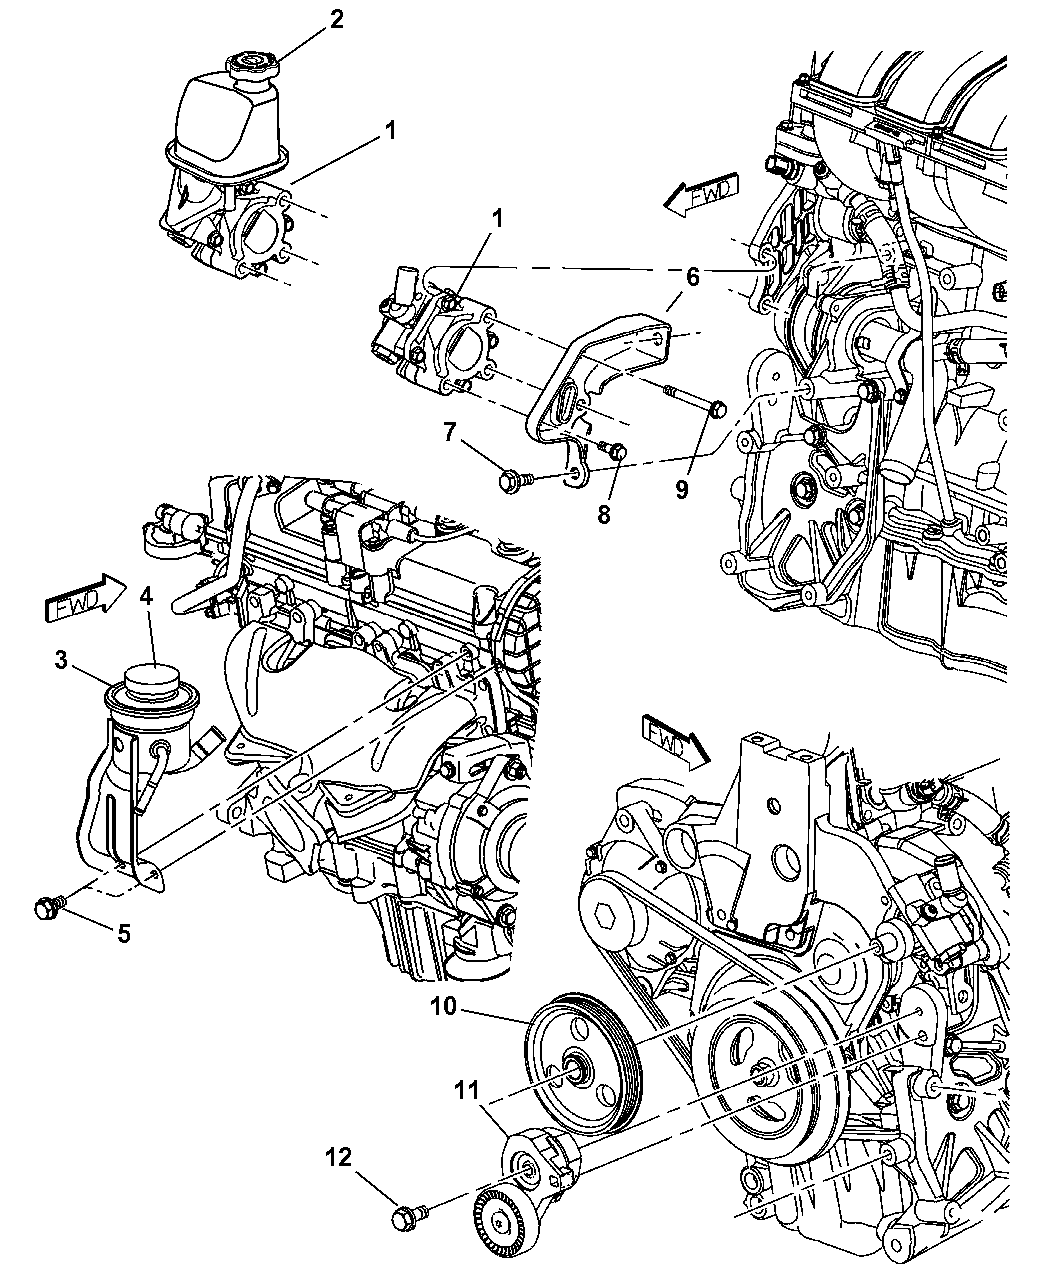 Pt Cruiser Engine Parts Diagram - Free Wiring Diagram | Pt Cruiser 2 4 Engine Diagram |  | Free Wiring Diagram